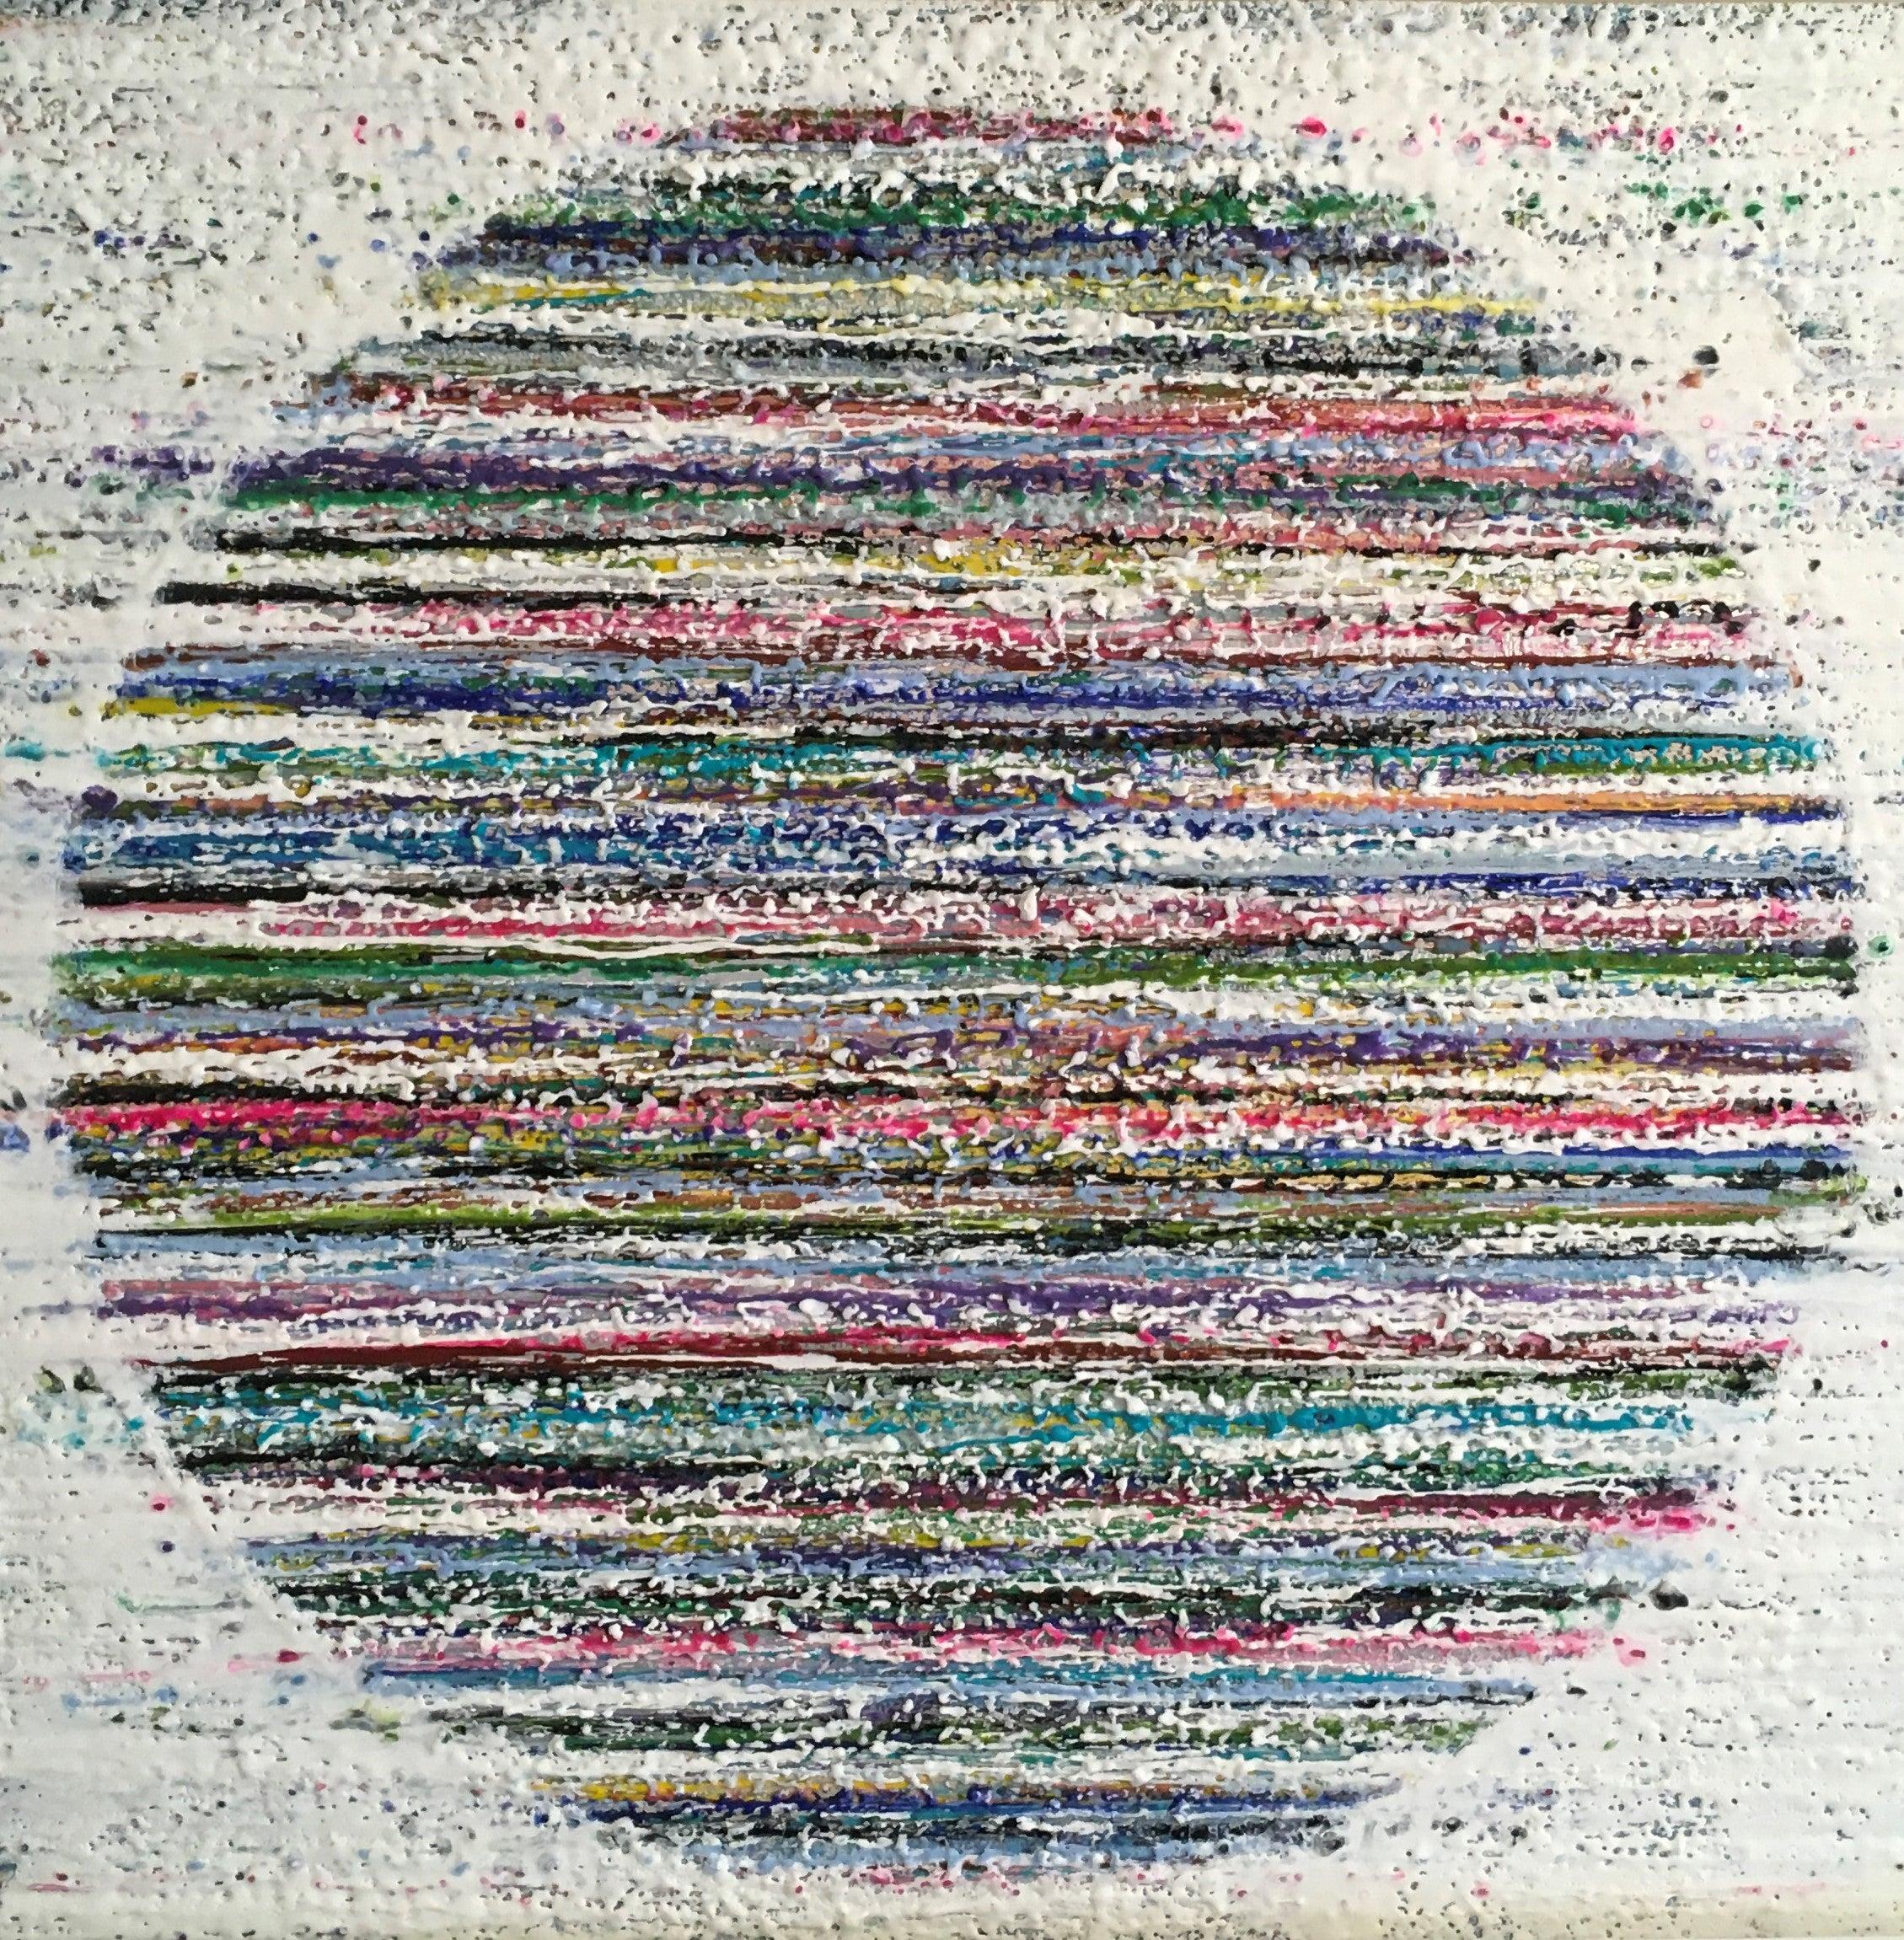 Cape Breton, Encaustic, Blue, Pink, Green, White, Circle, Textured, 30x30